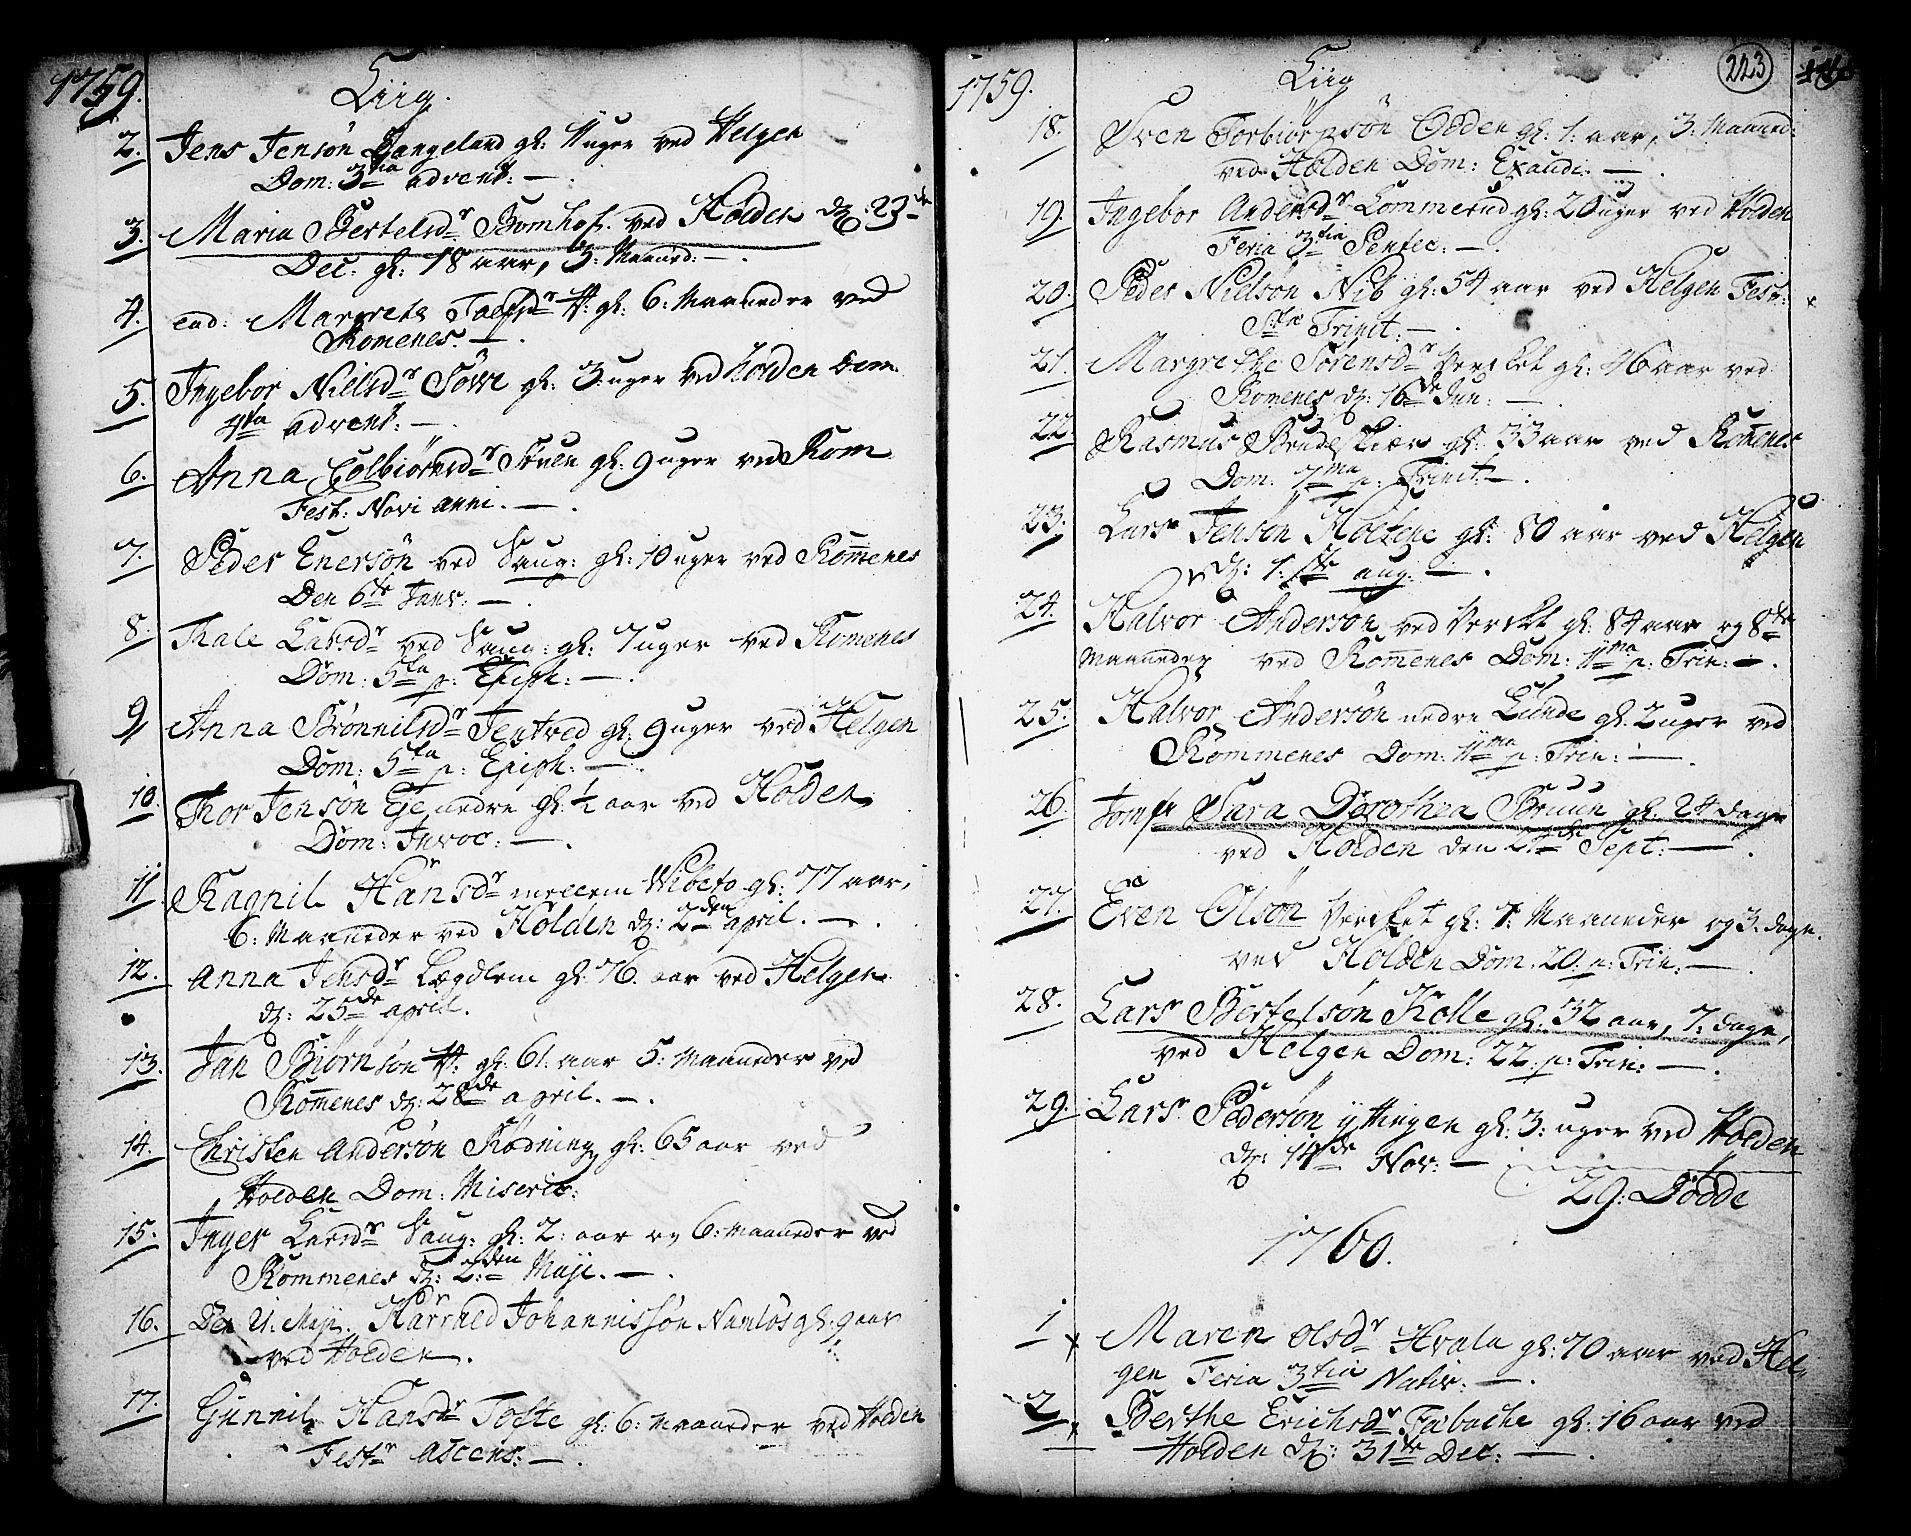 SAKO, Holla kirkebøker, F/Fa/L0001: Ministerialbok nr. 1, 1717-1779, s. 223